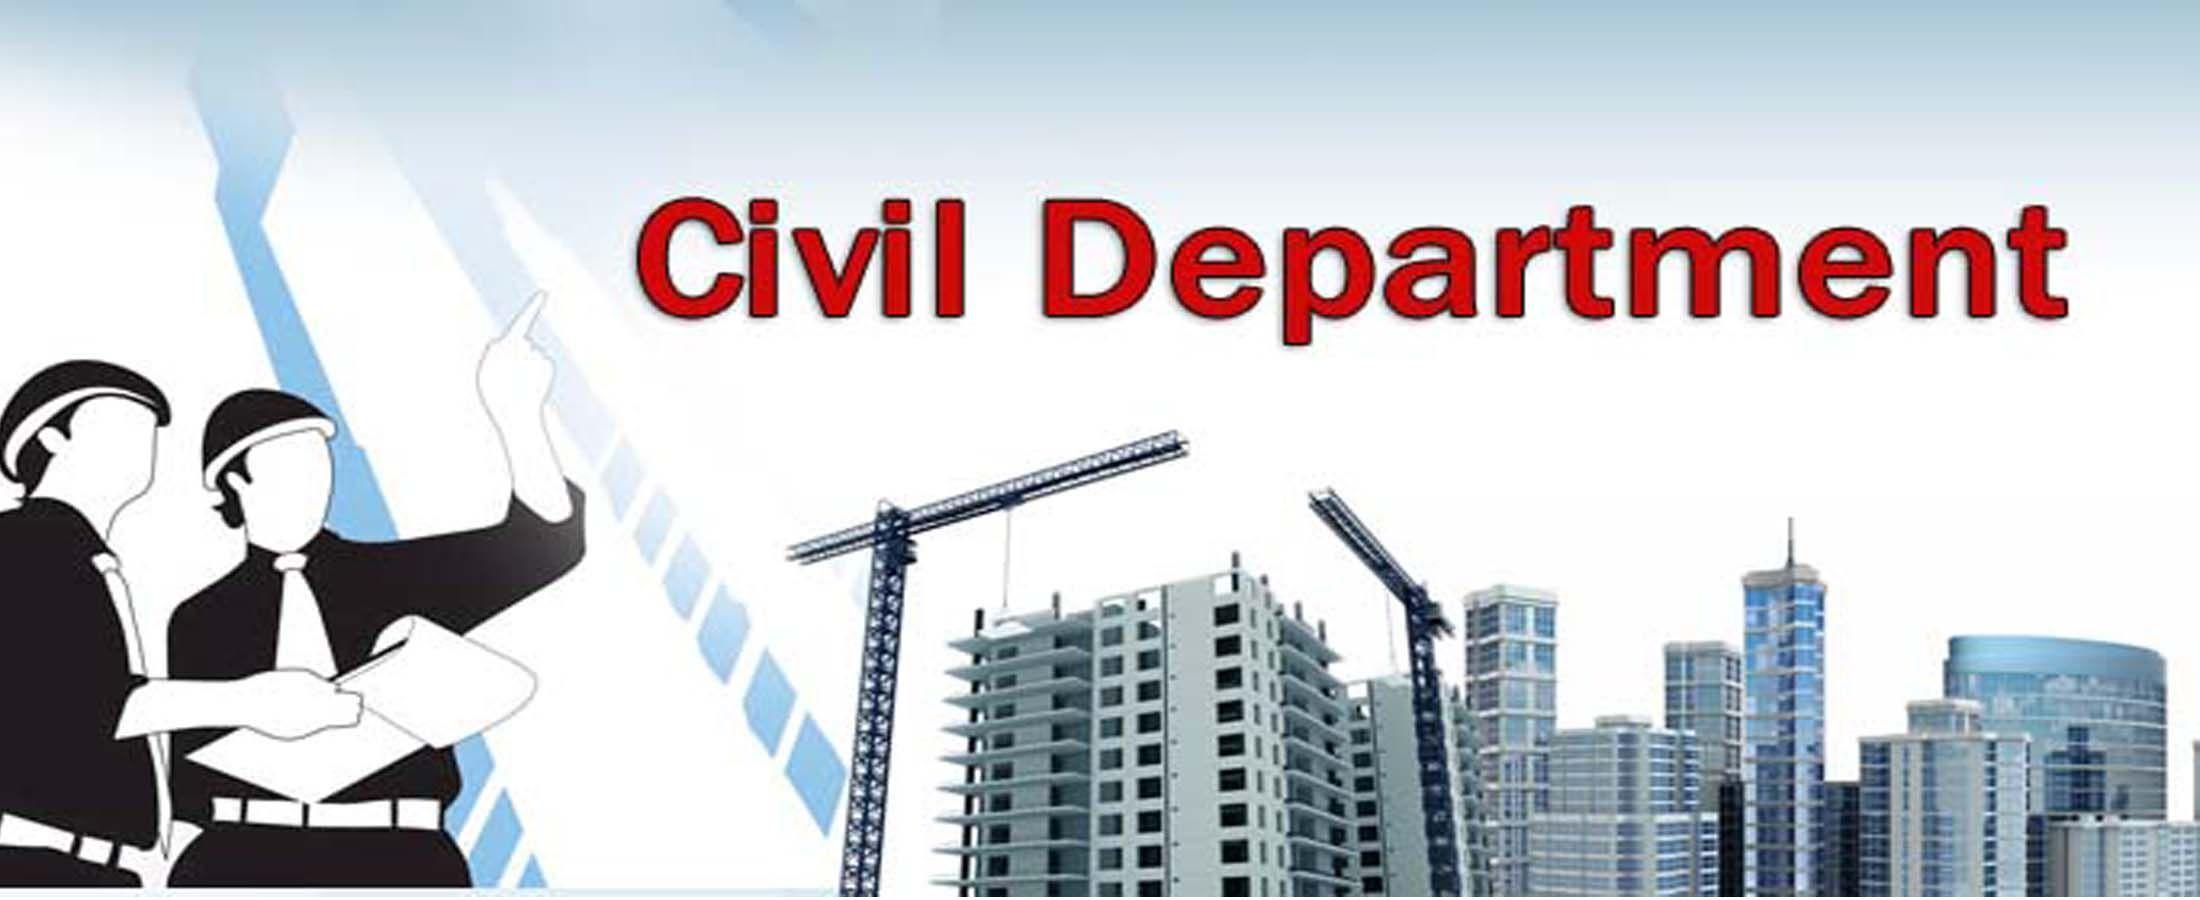 50+ Civil Engineering Wallpapers Download at